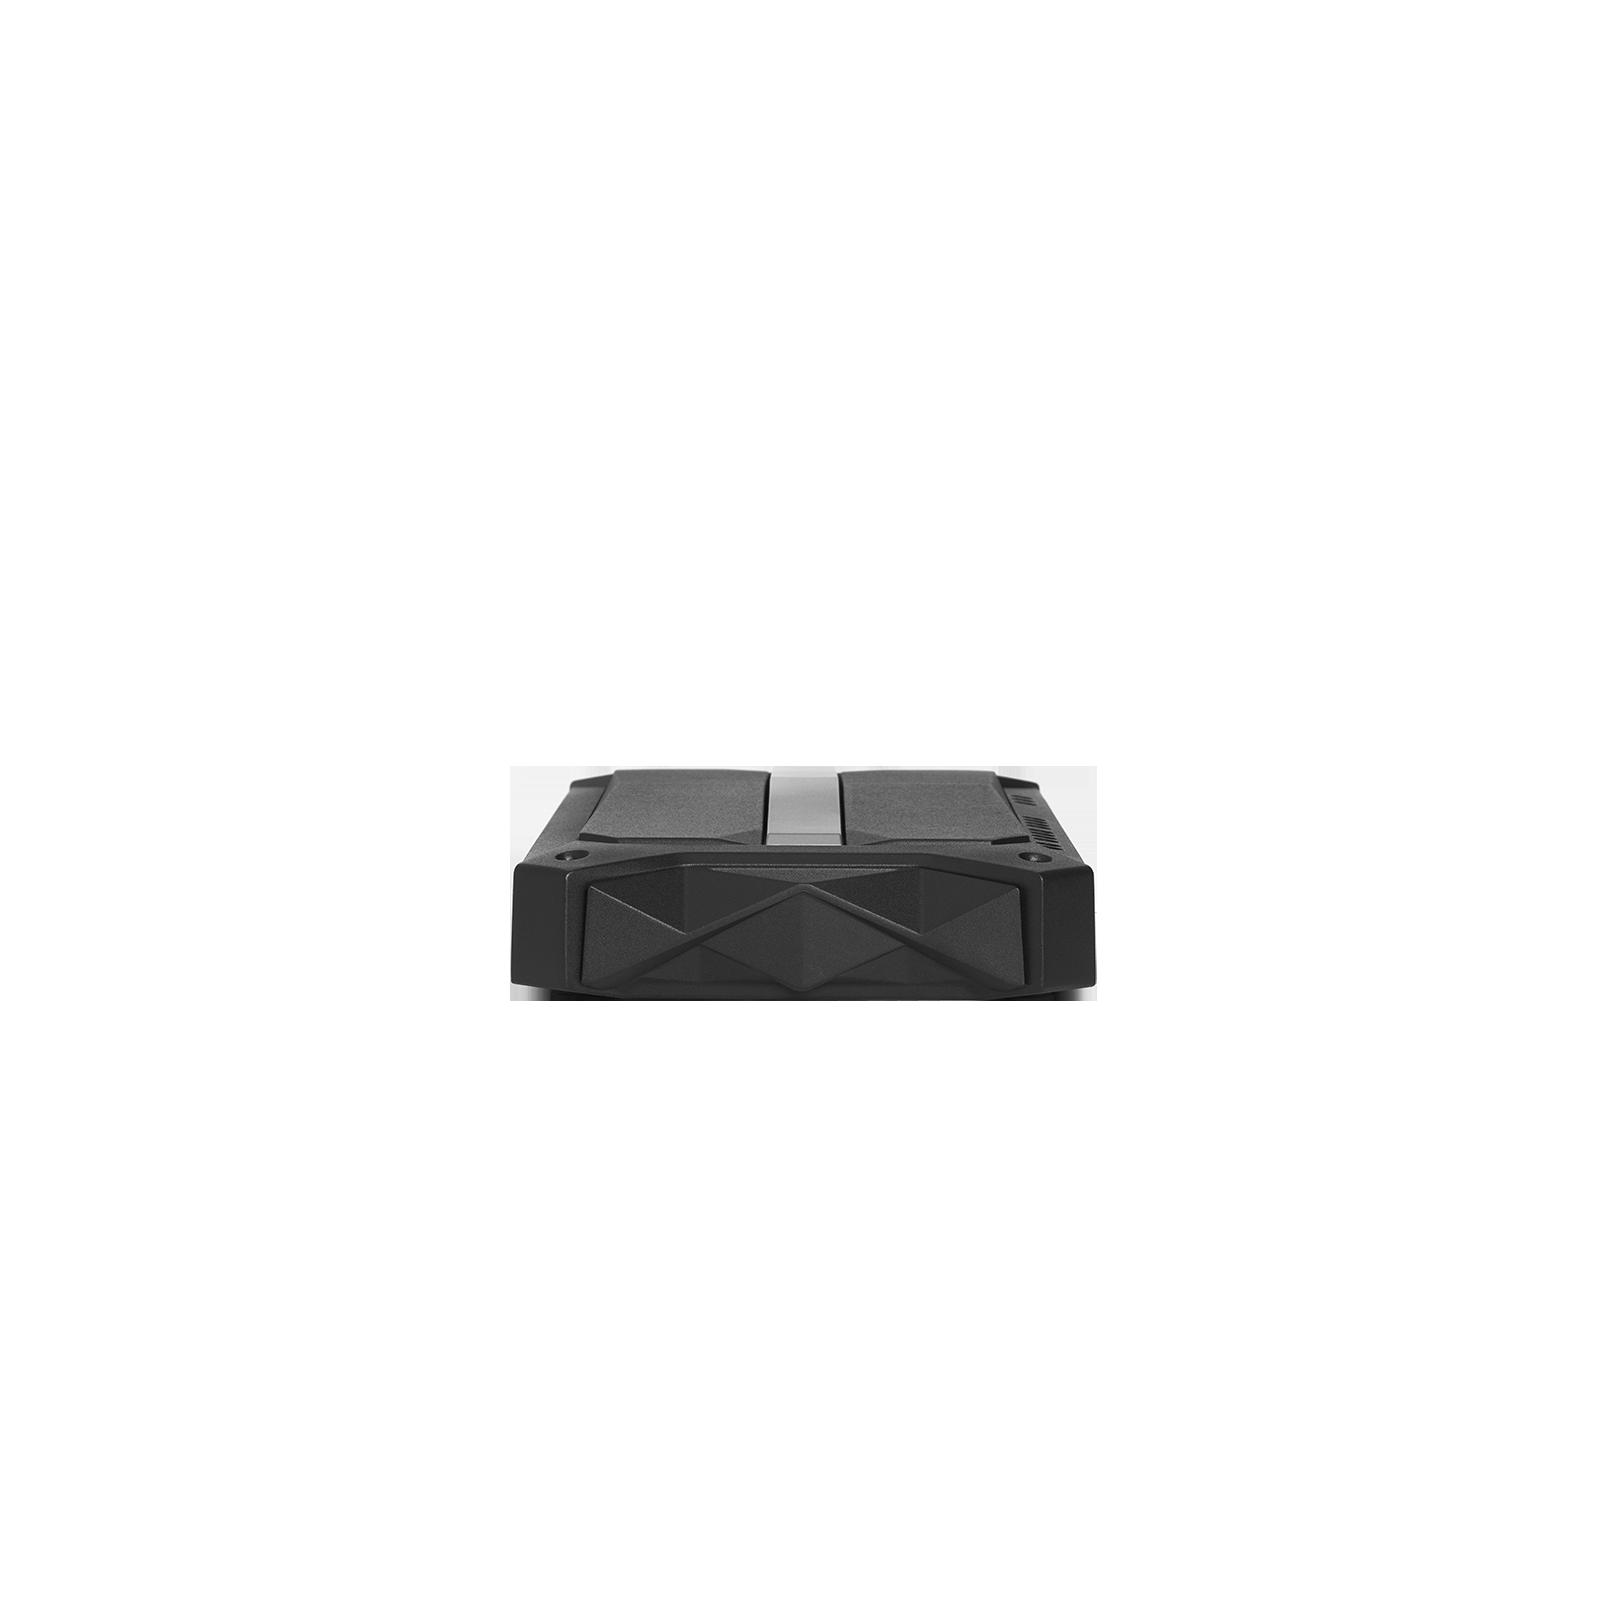 Stadium 5 - Black - High-performance multi-channel Class D amplifier - Detailshot 3